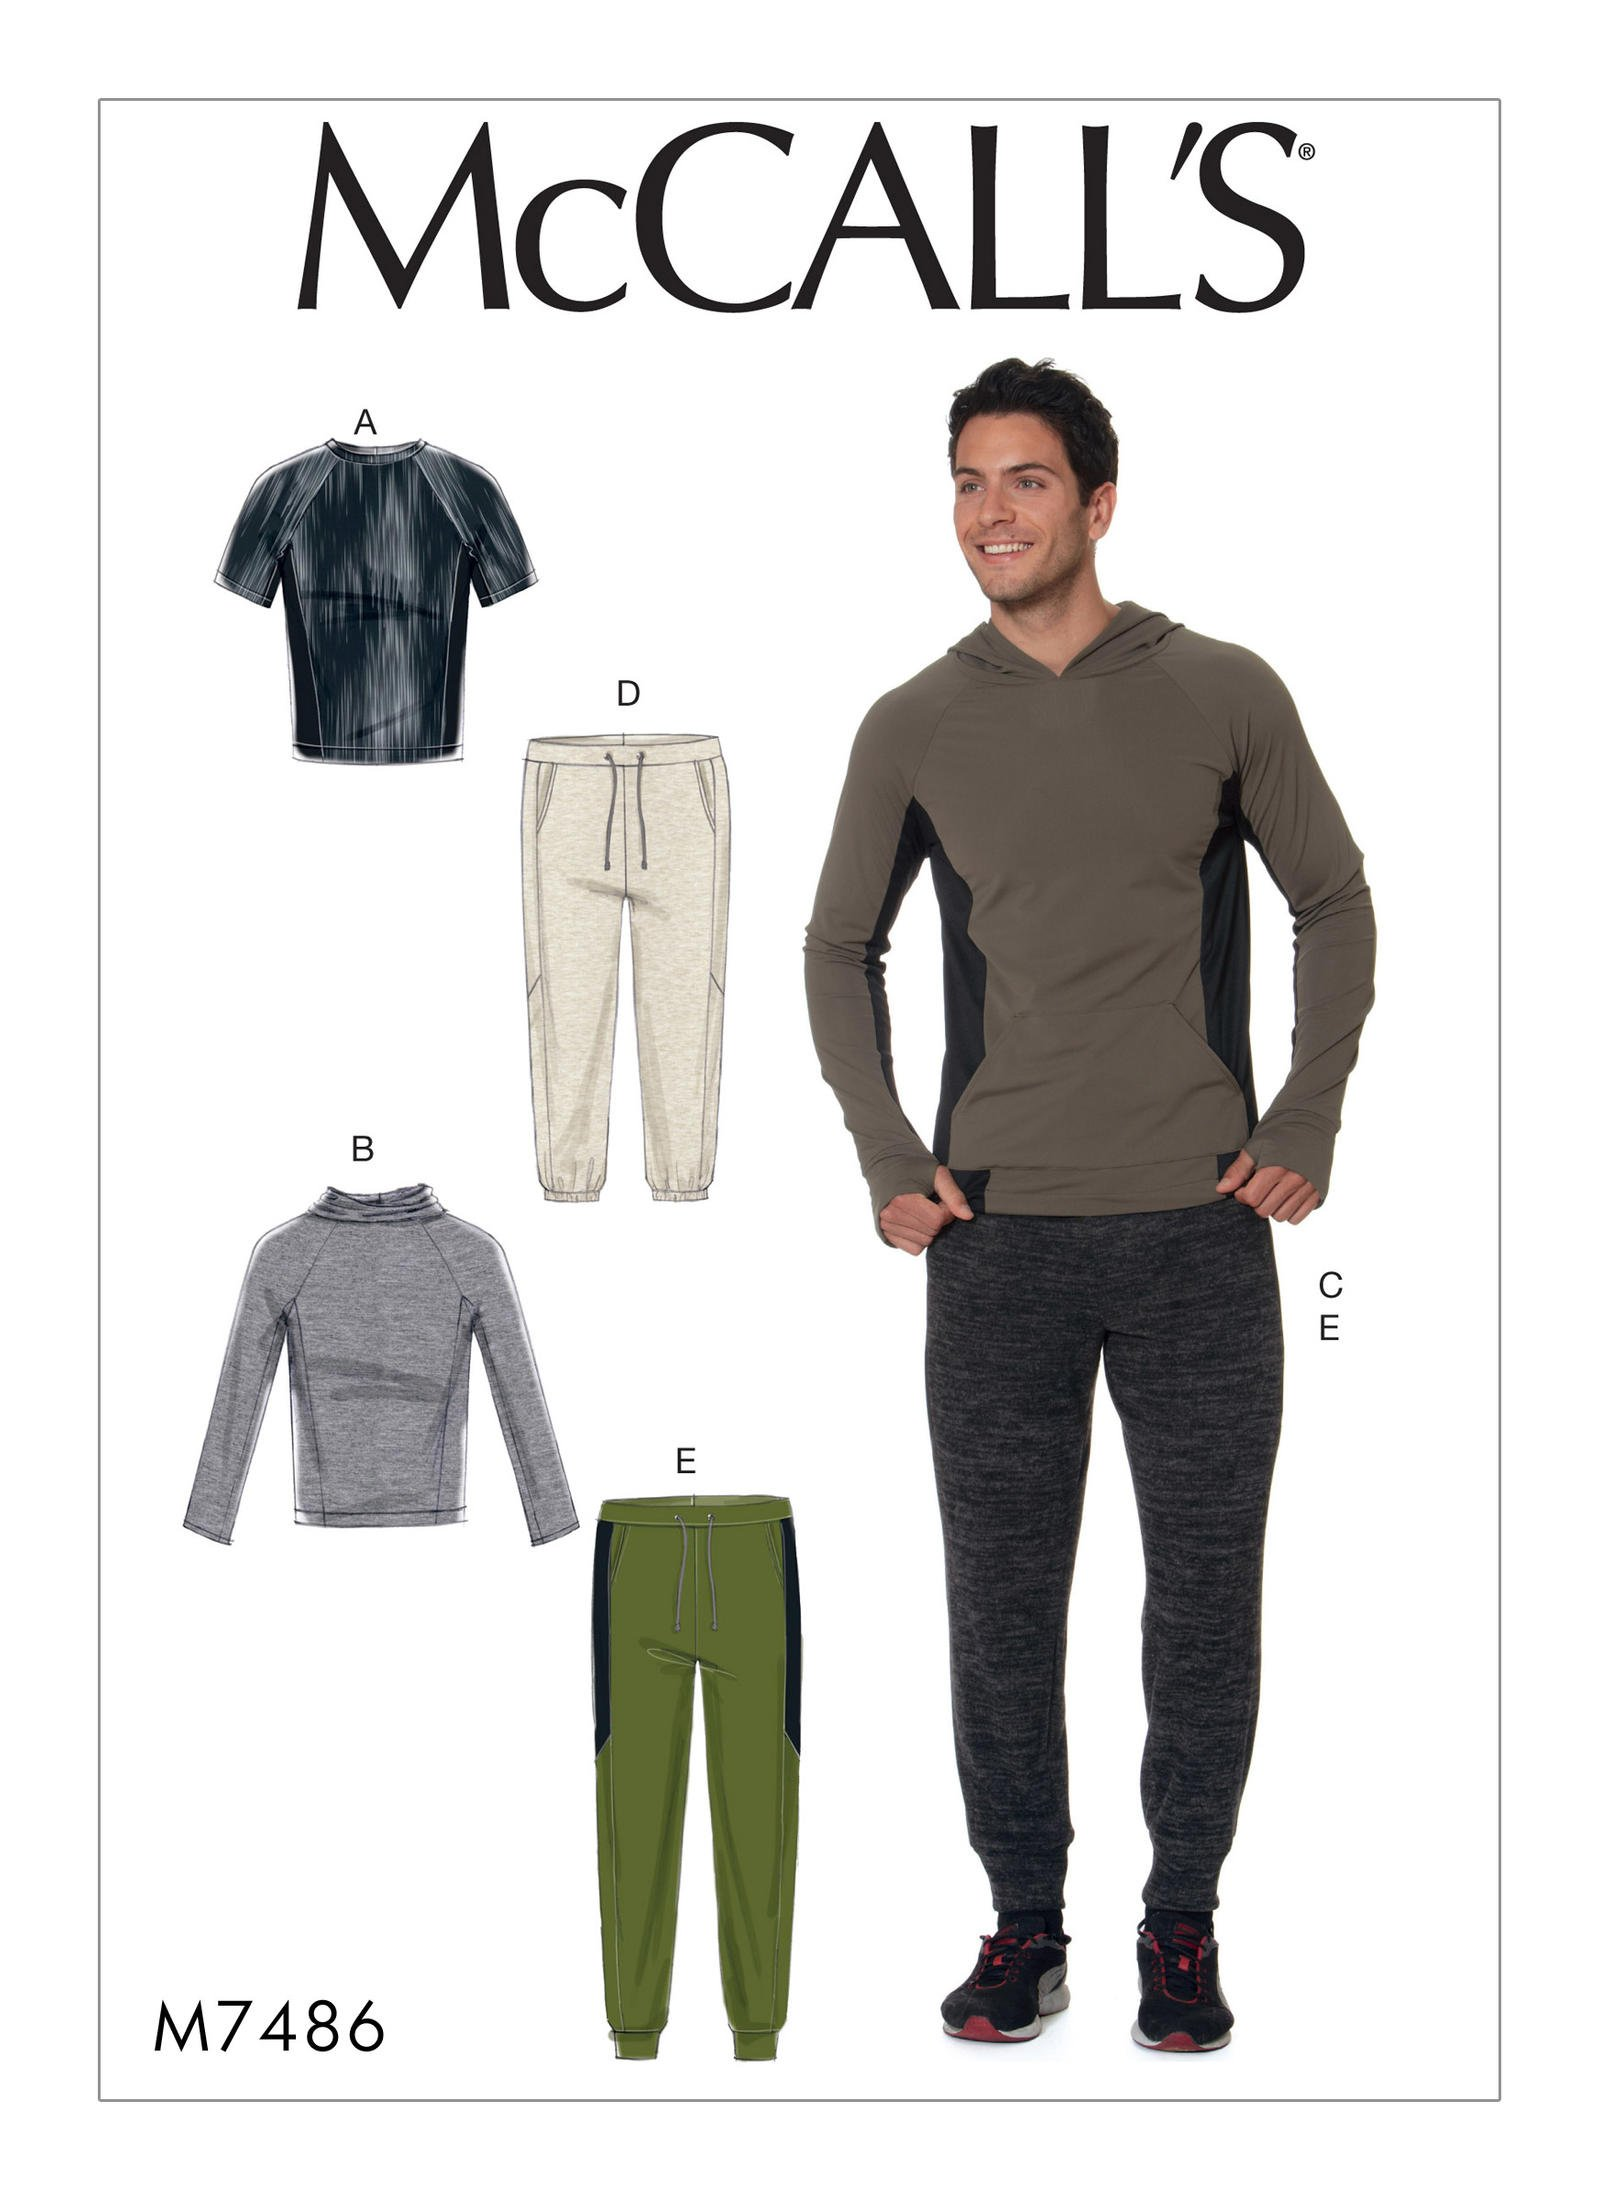 McCall\'s 7486 Men\'s Raglan Sleeve Tops and Drawstring Pants